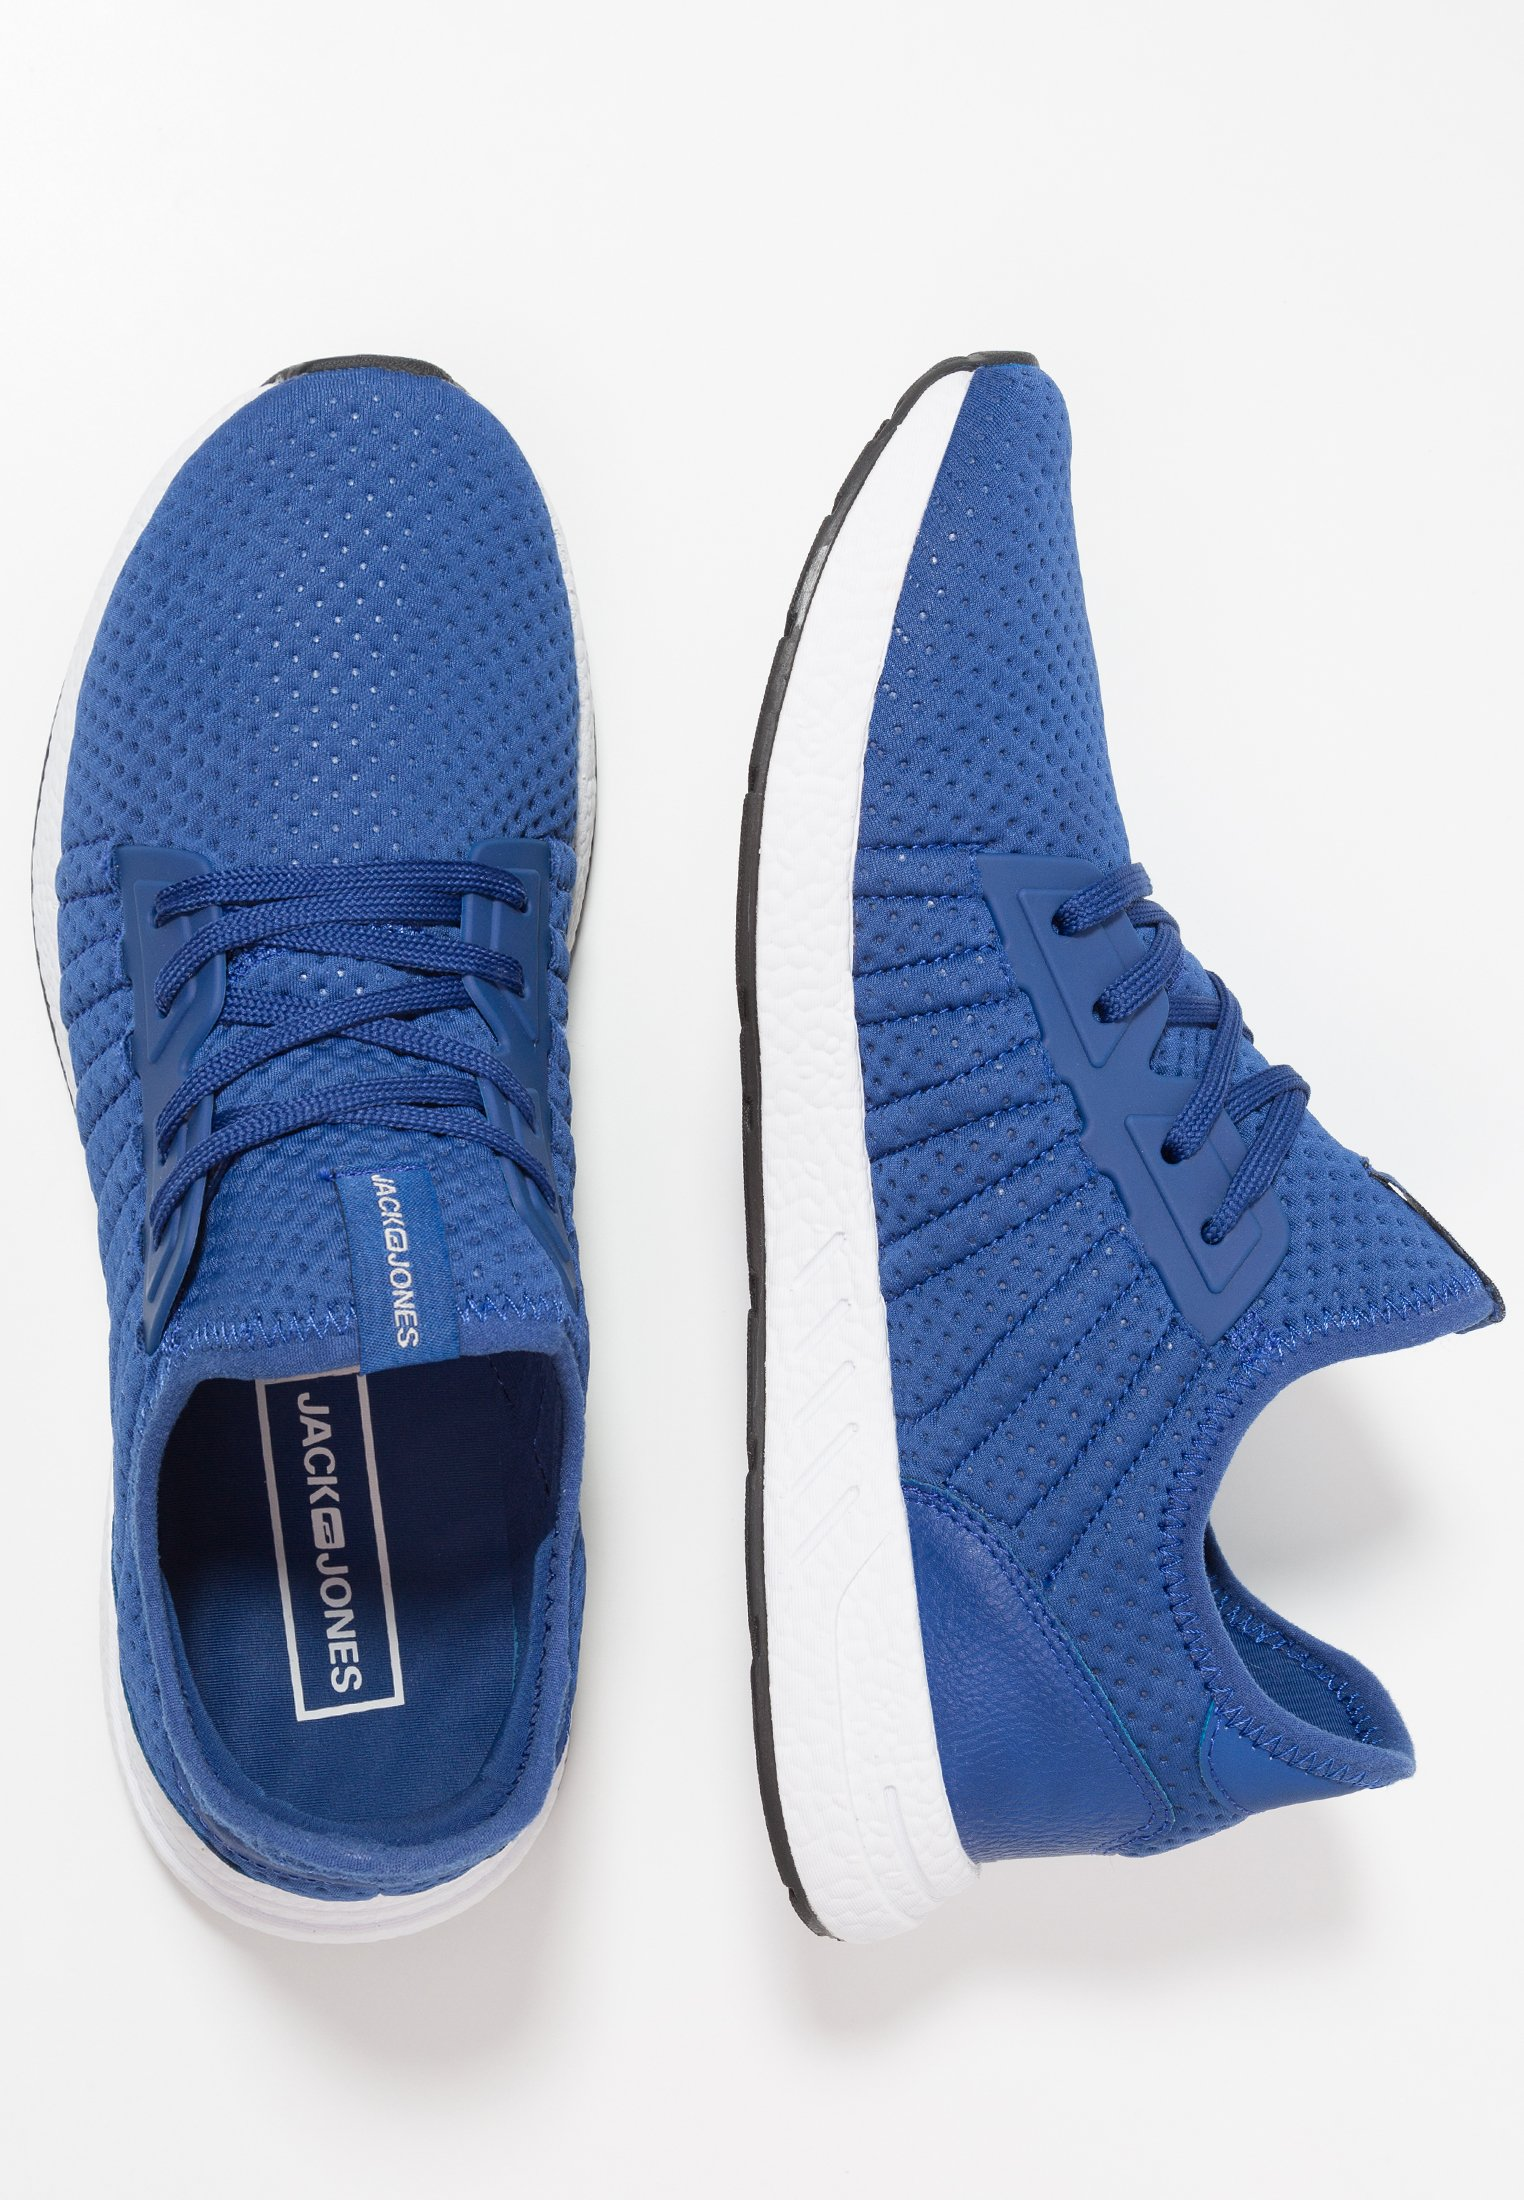 Jack & Jones Jfwmike - Sneakers Basse Limoges Blue wWOK5SC